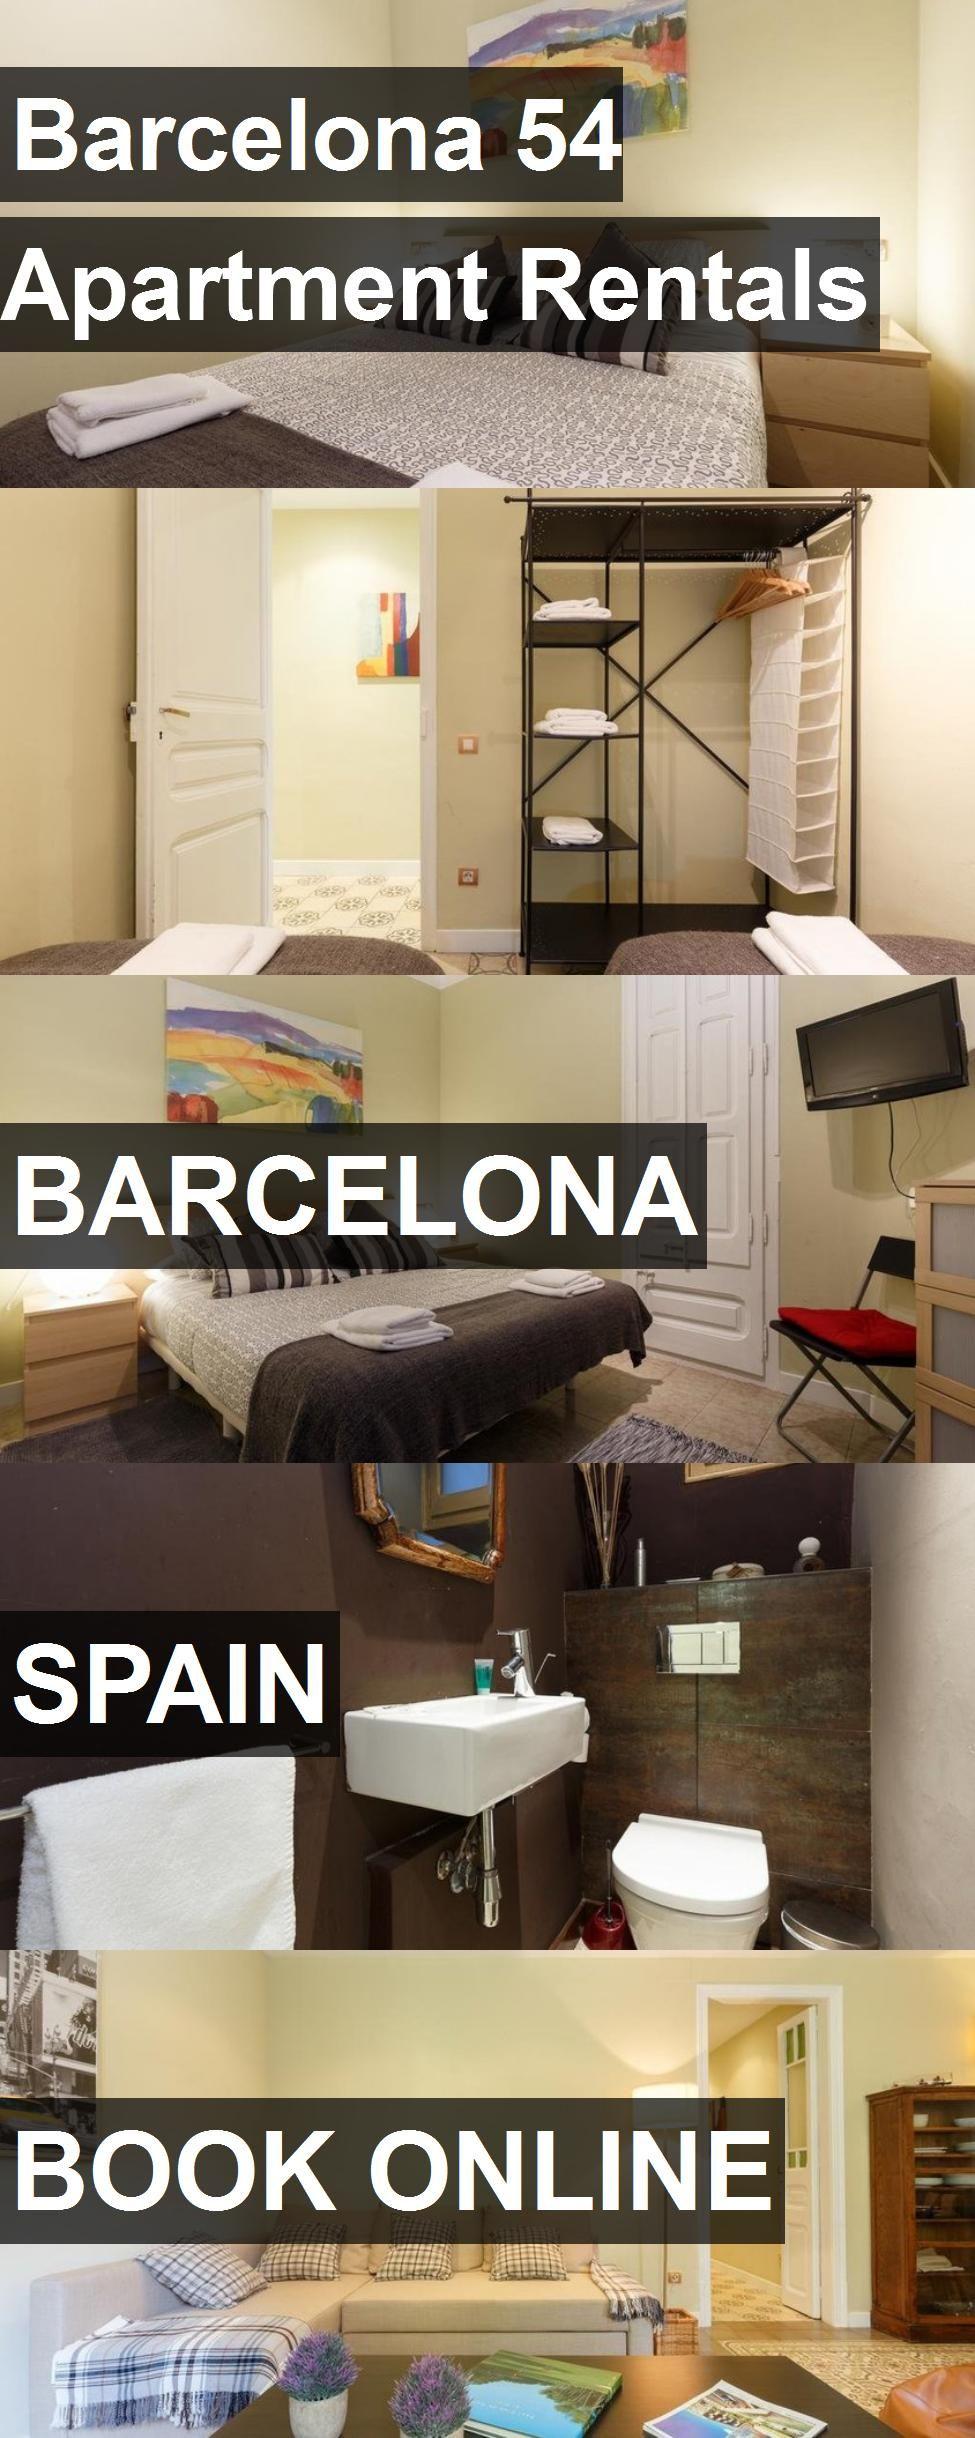 Barcelona 54 Apartment Rentals in Barcelona, Spain. For ...